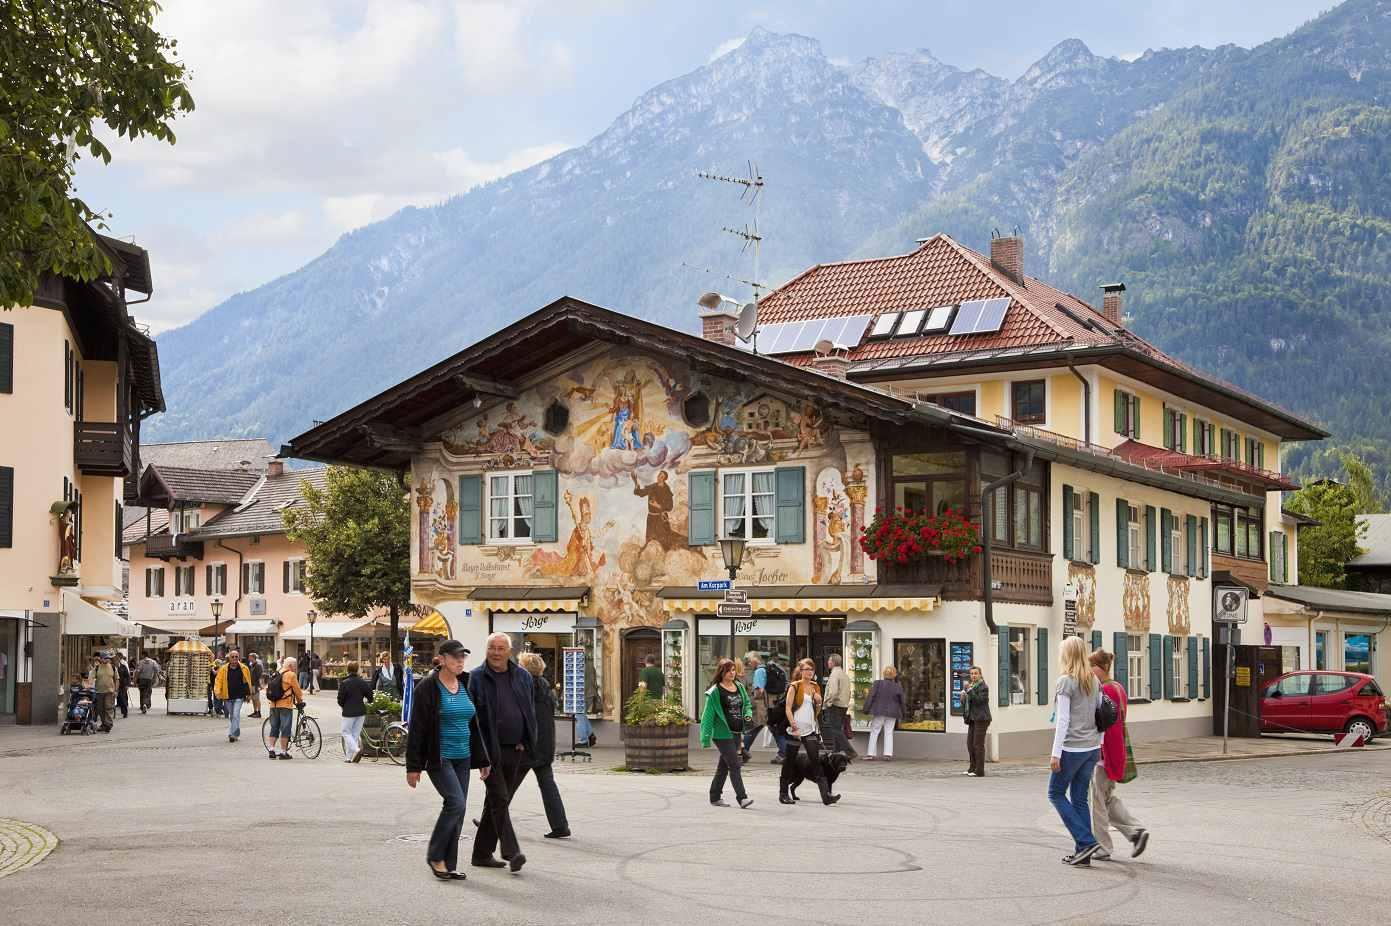 10 Fun Things To Do In Garmisch Germany